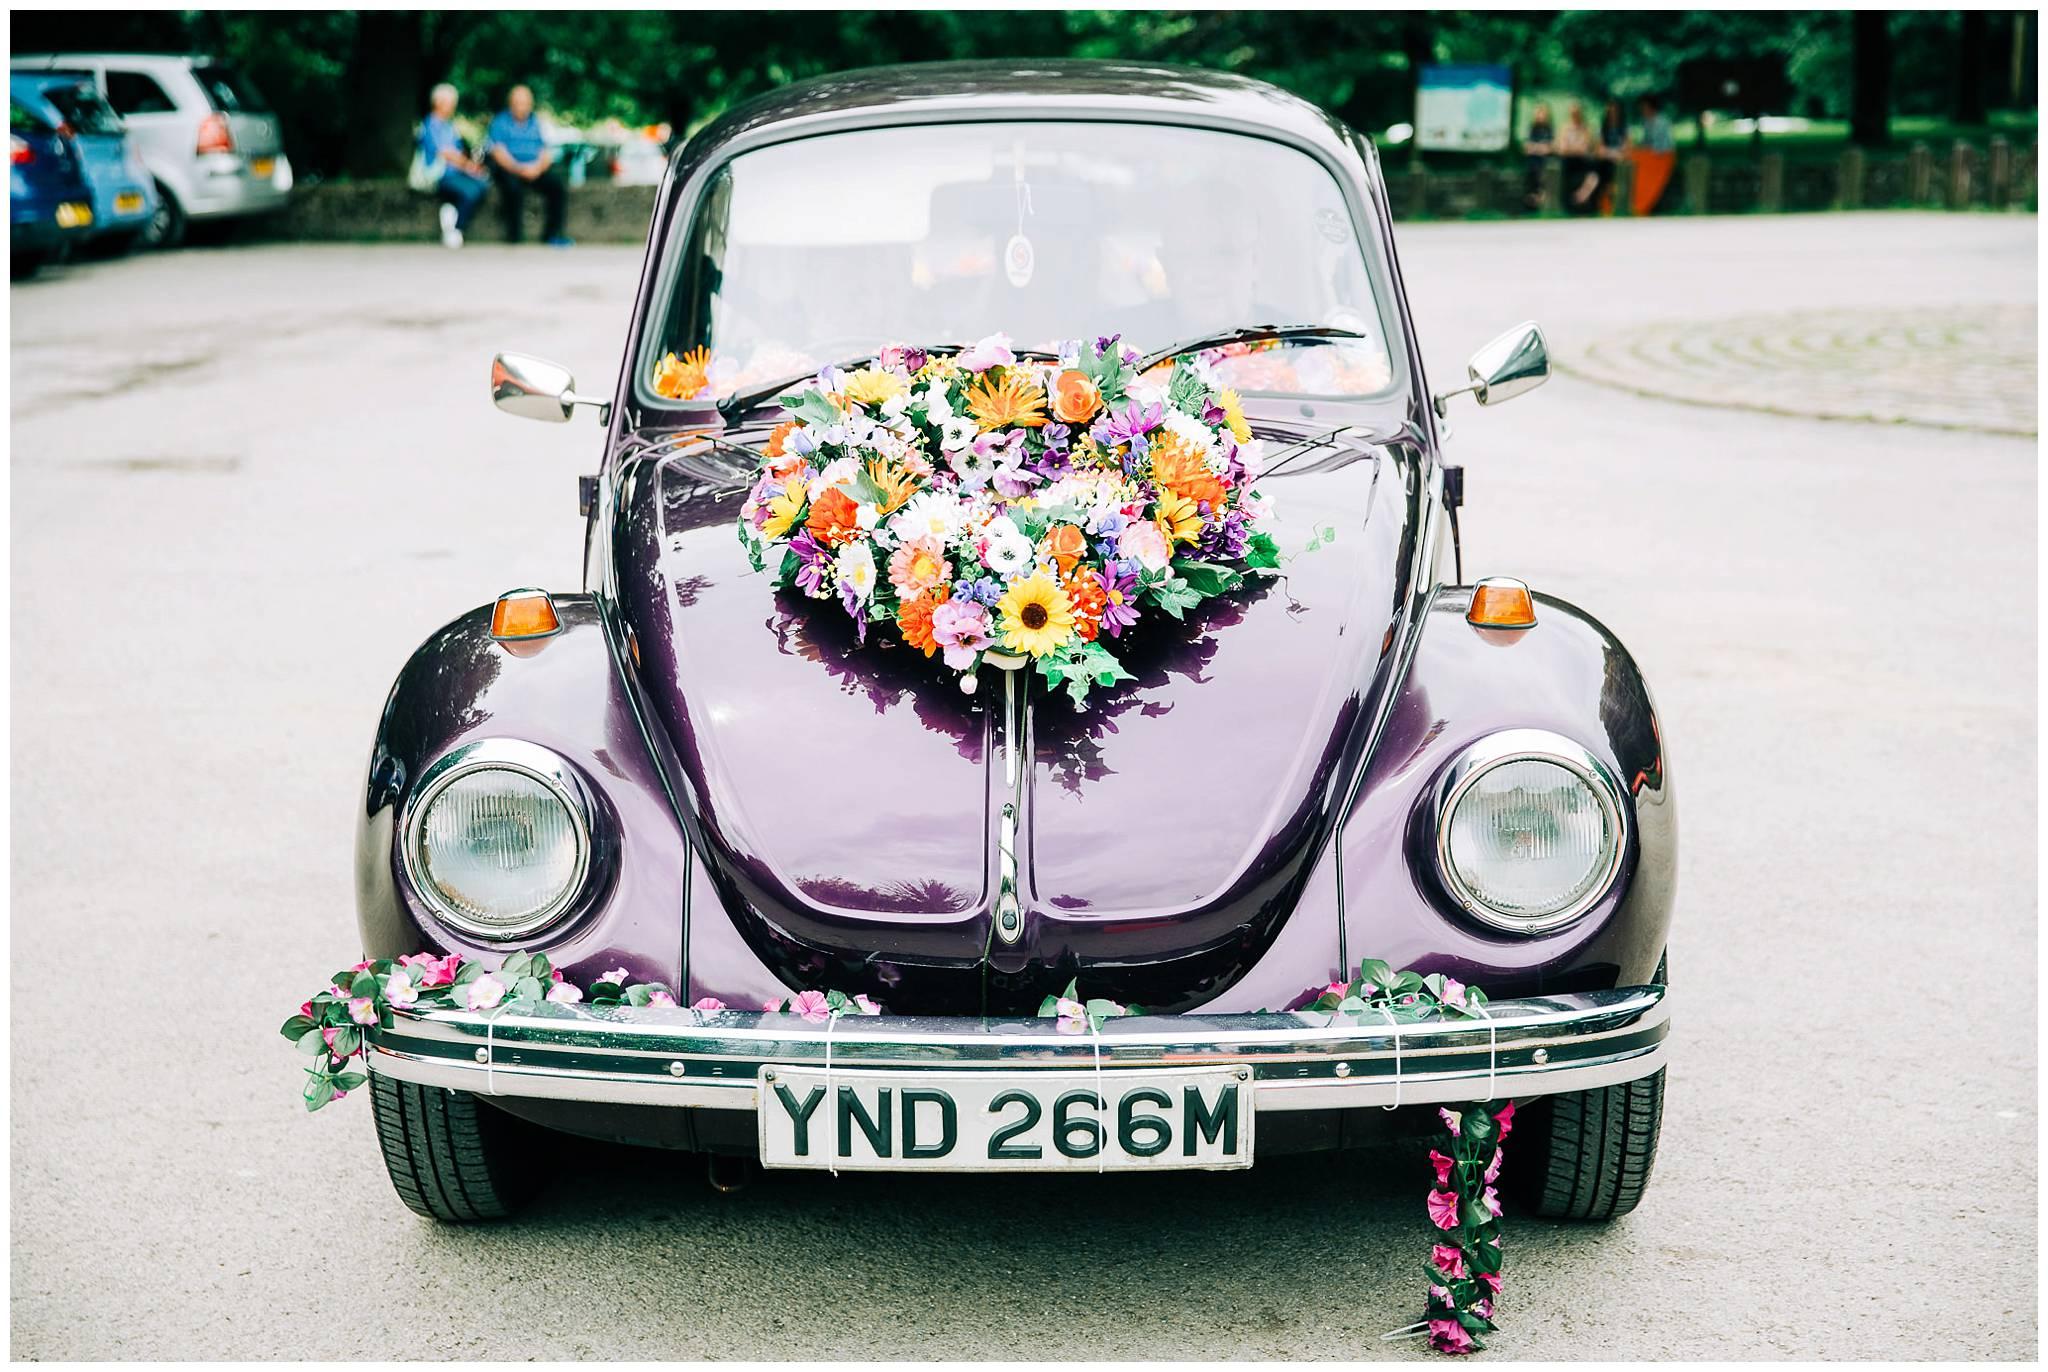 vintage purple VW beetle with floral heart shaped arrangemen on front